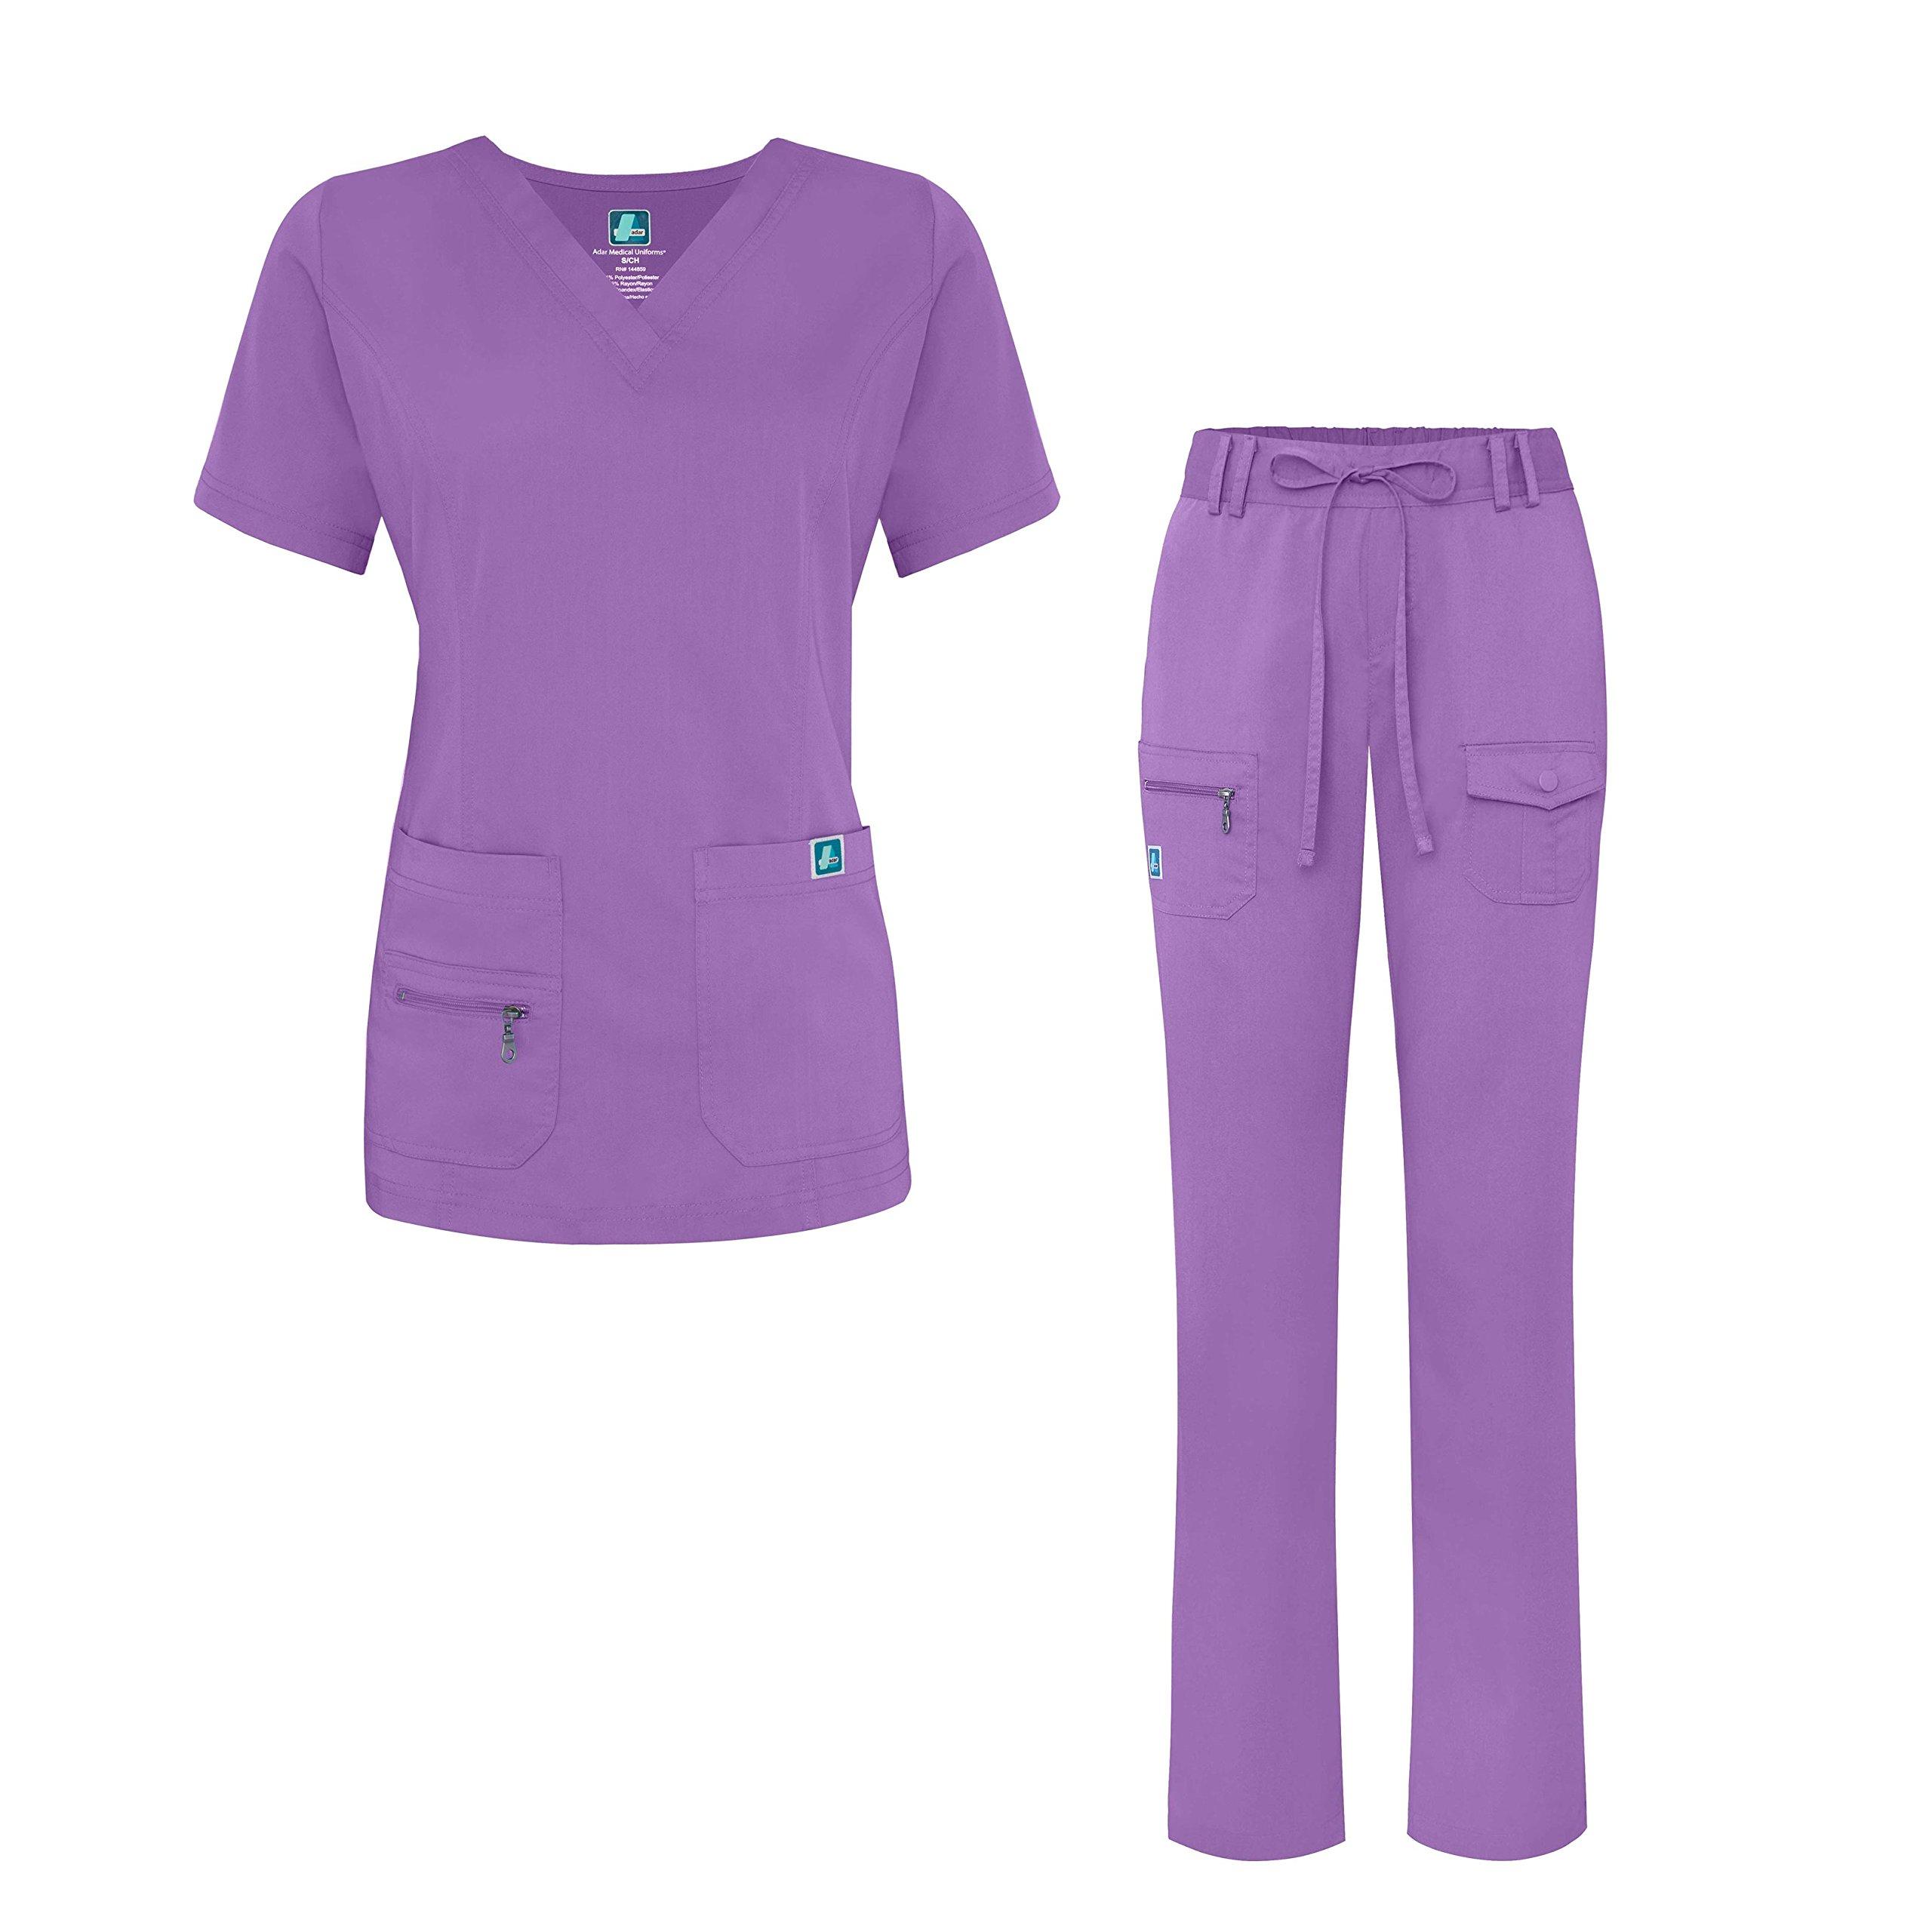 Adar Indulgence Jr. Fit Women's Scrub Set - Enhanced V-Neck Top/Multi Pocket Pants - 4400 - Lavender - M